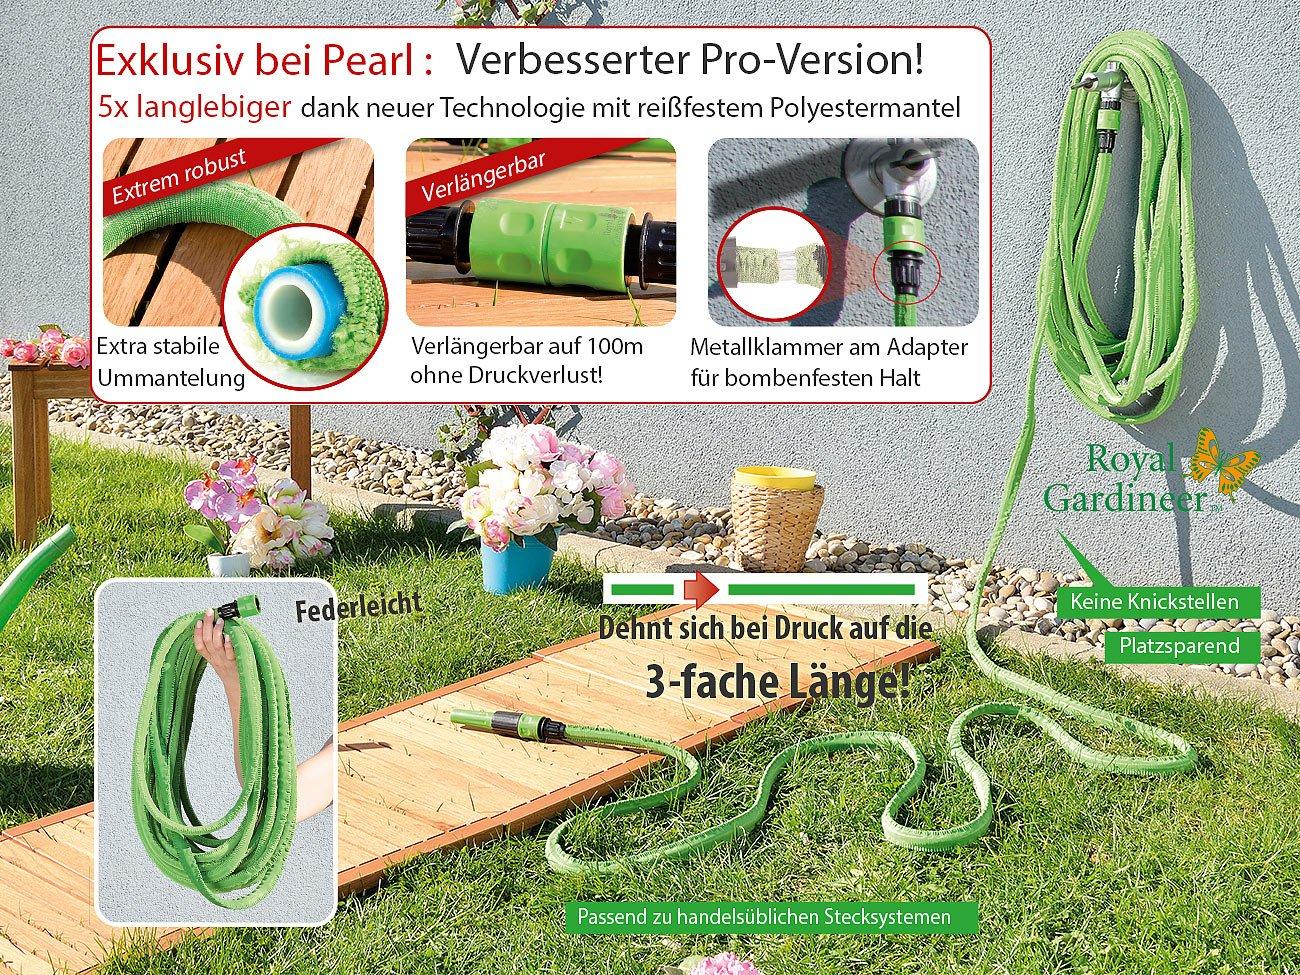 Royal Gardineer Dehnbarer Schlauch: Dehnbarer Gartenschlauch Pro.V2, 2,5 bis 7,5 m (Flexibler Wasserschlauch)